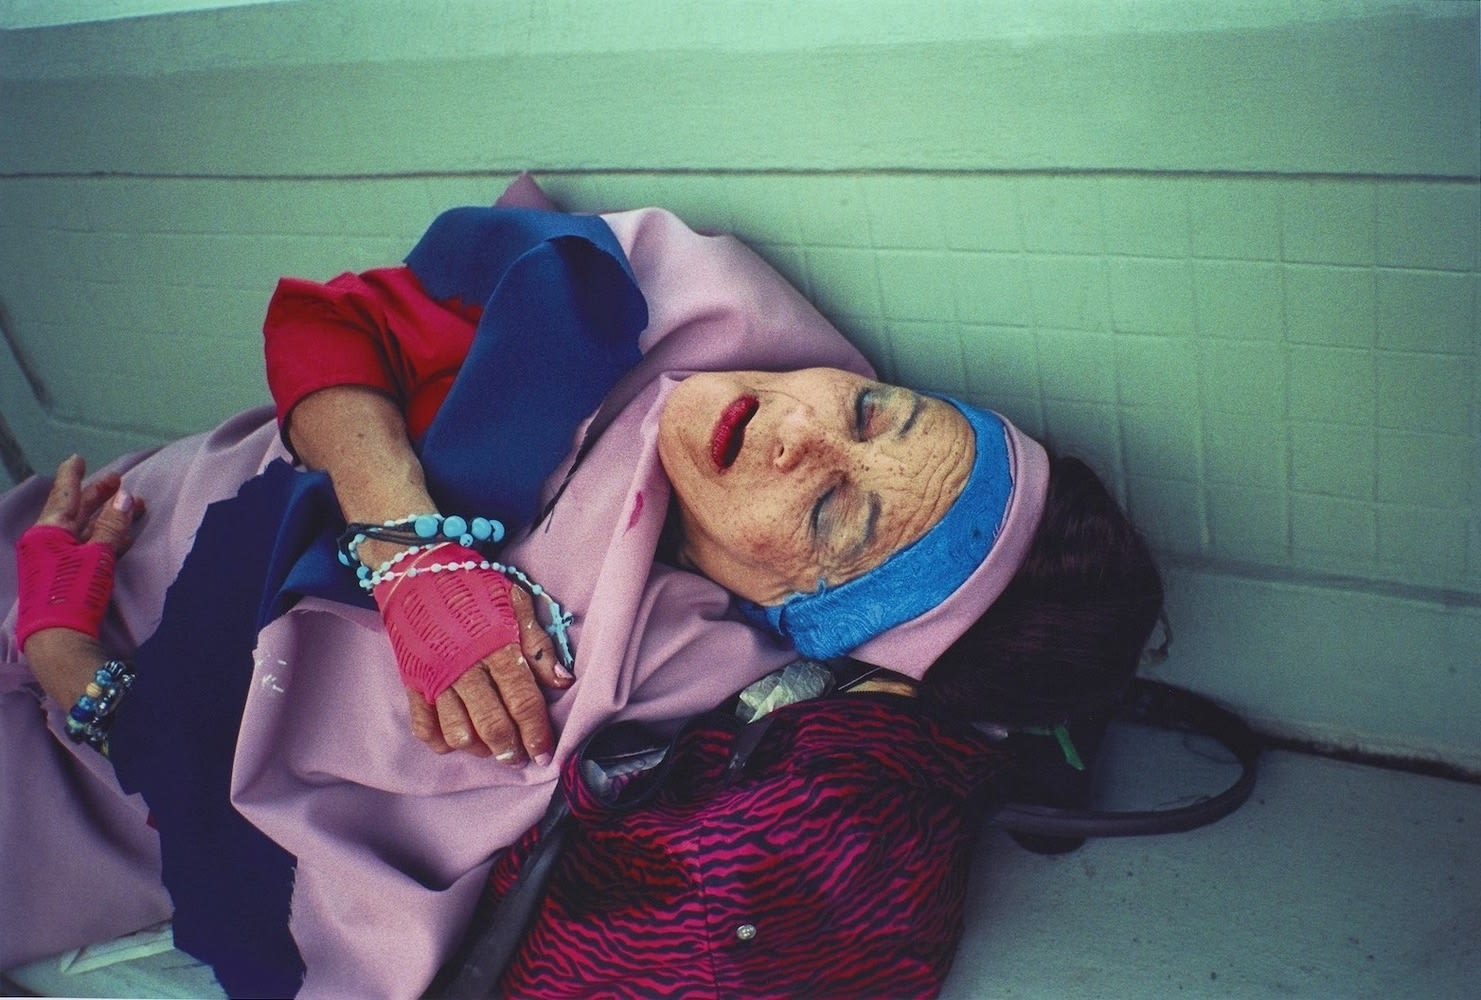 Arlene Gottfried, Untitled, n.d.